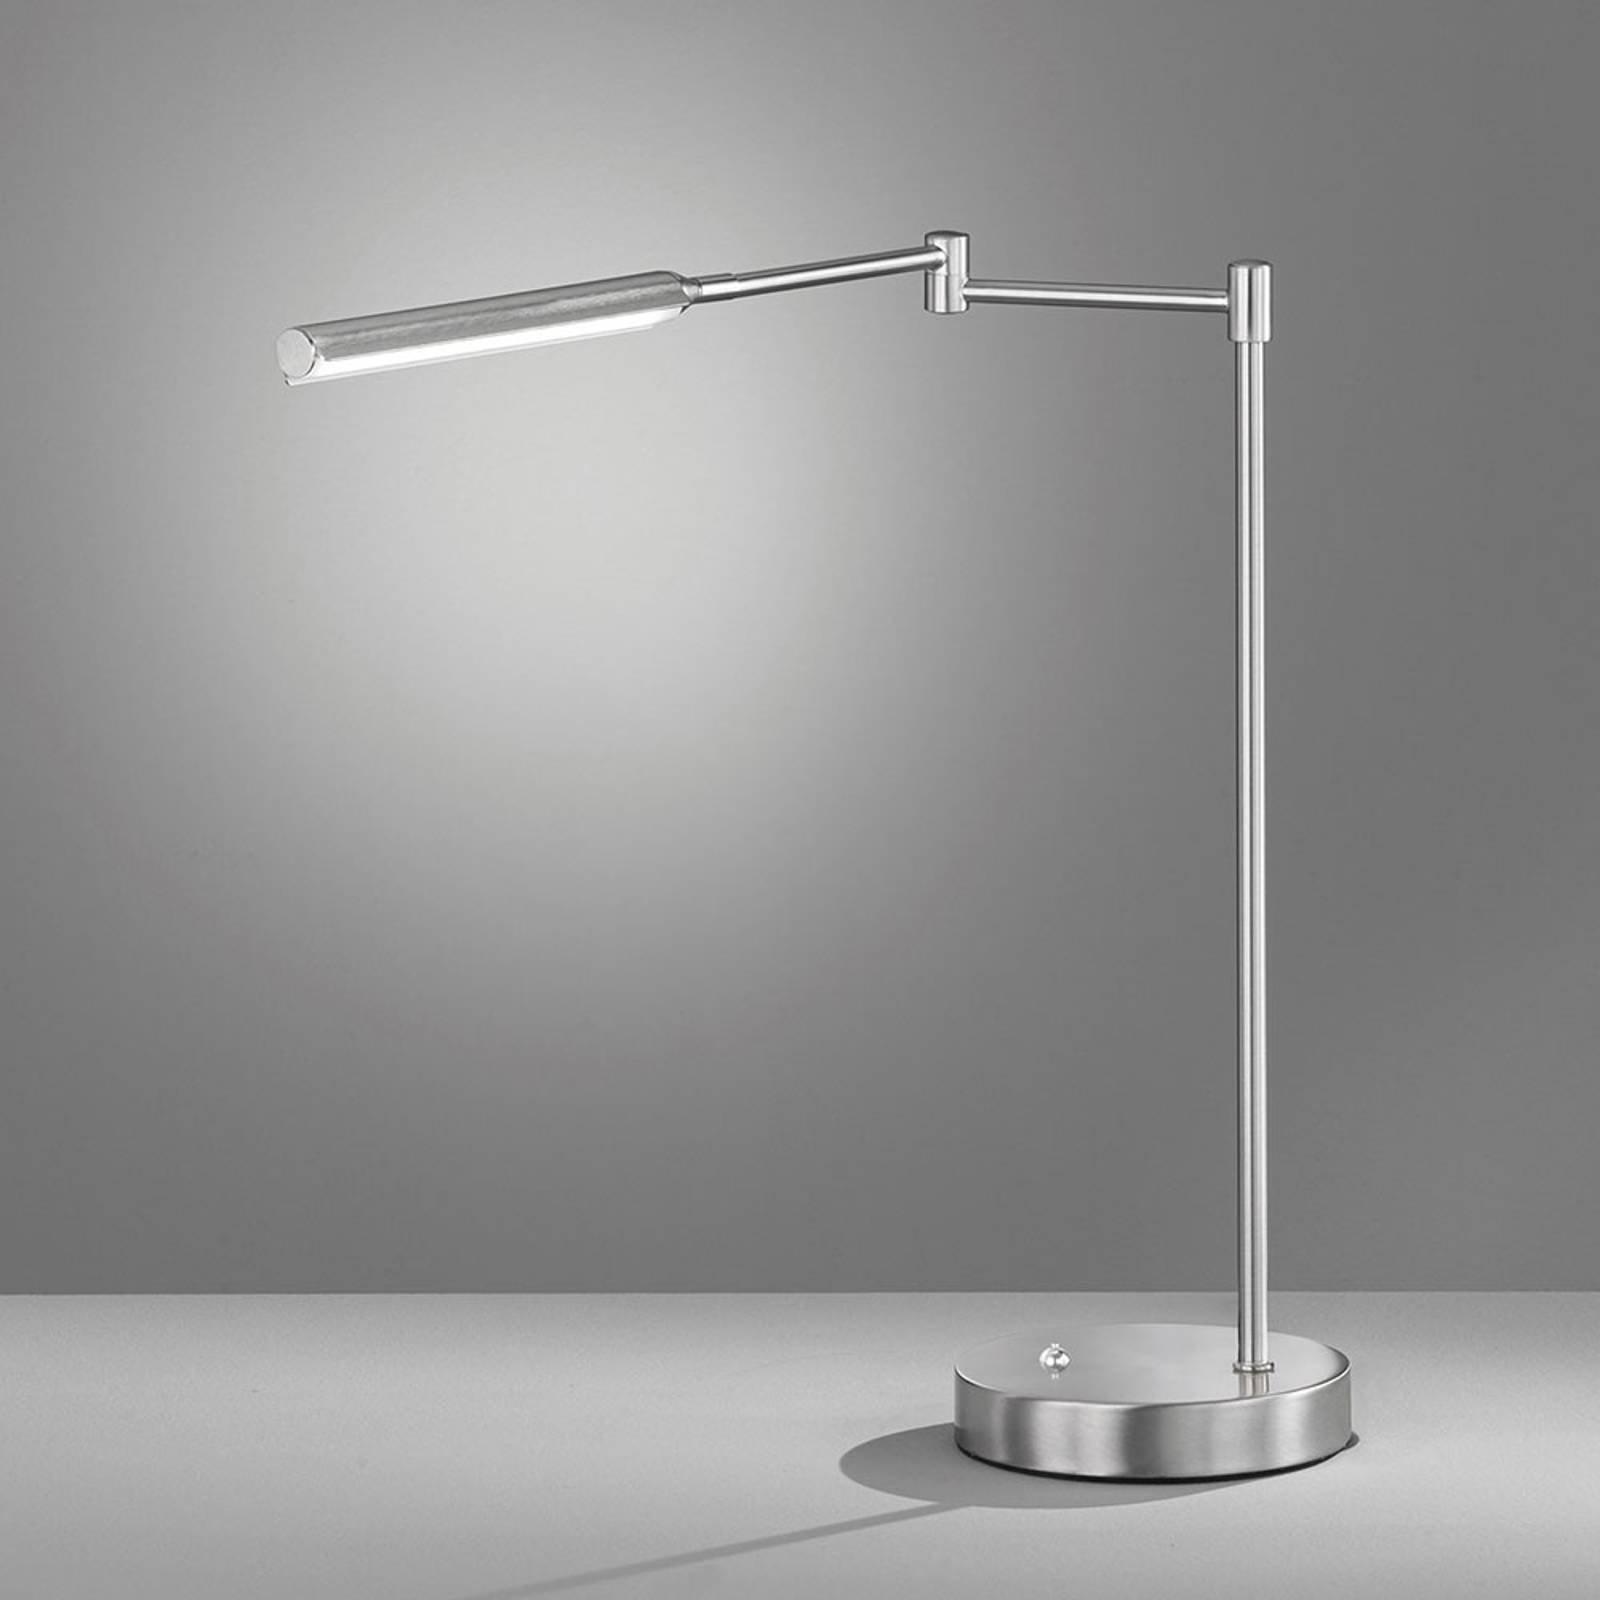 LED-bordlampe Nami, dimbar, nikkelfarget